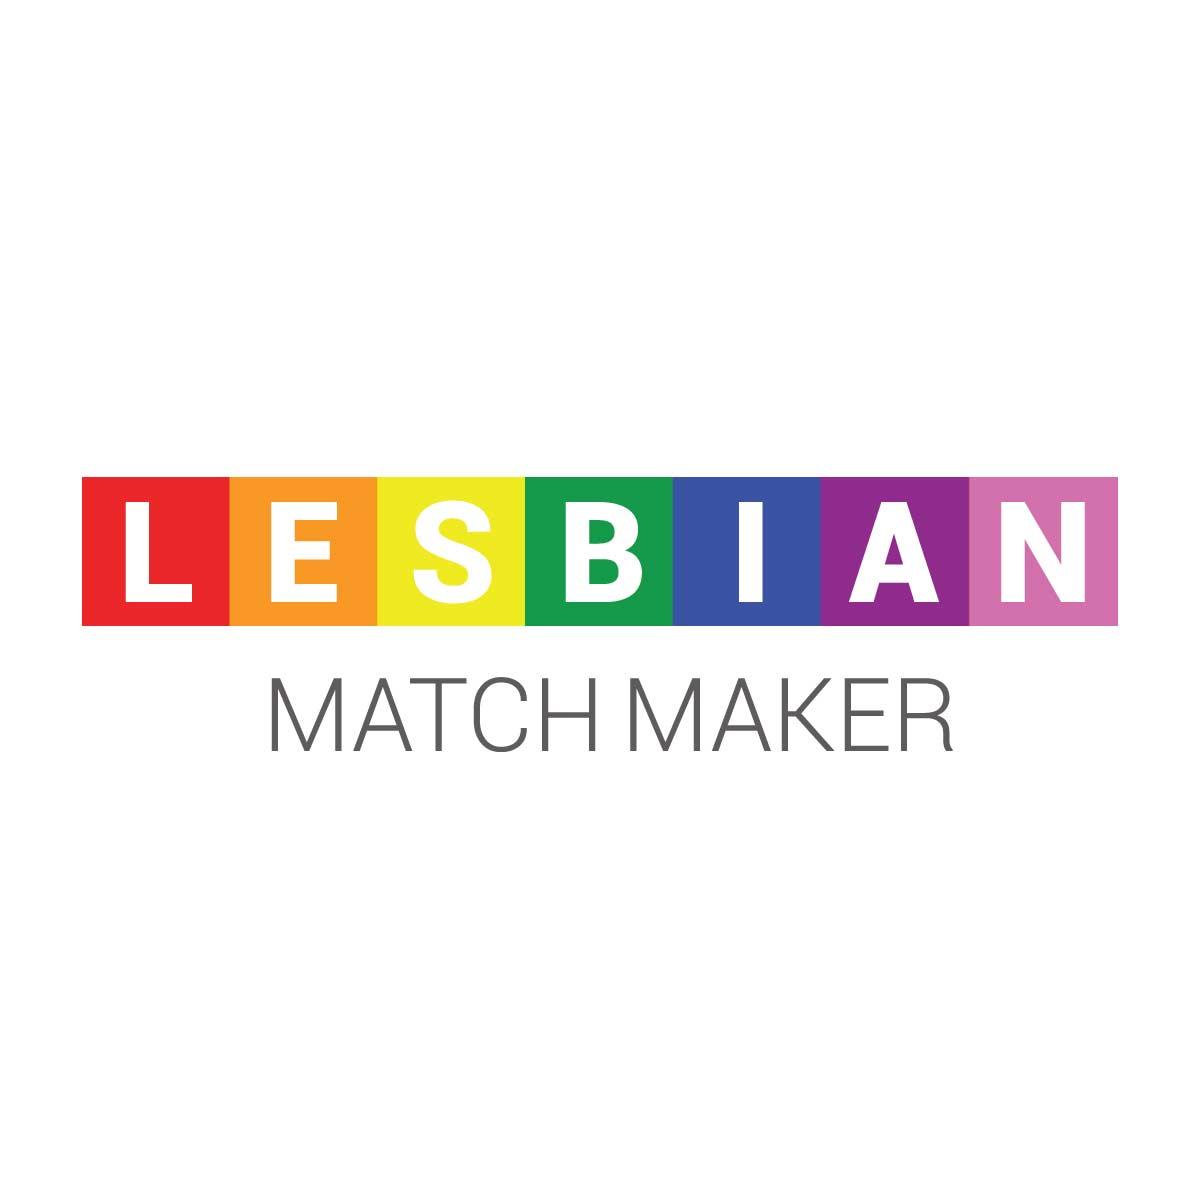 lesbianmatchmaker_1200x1200